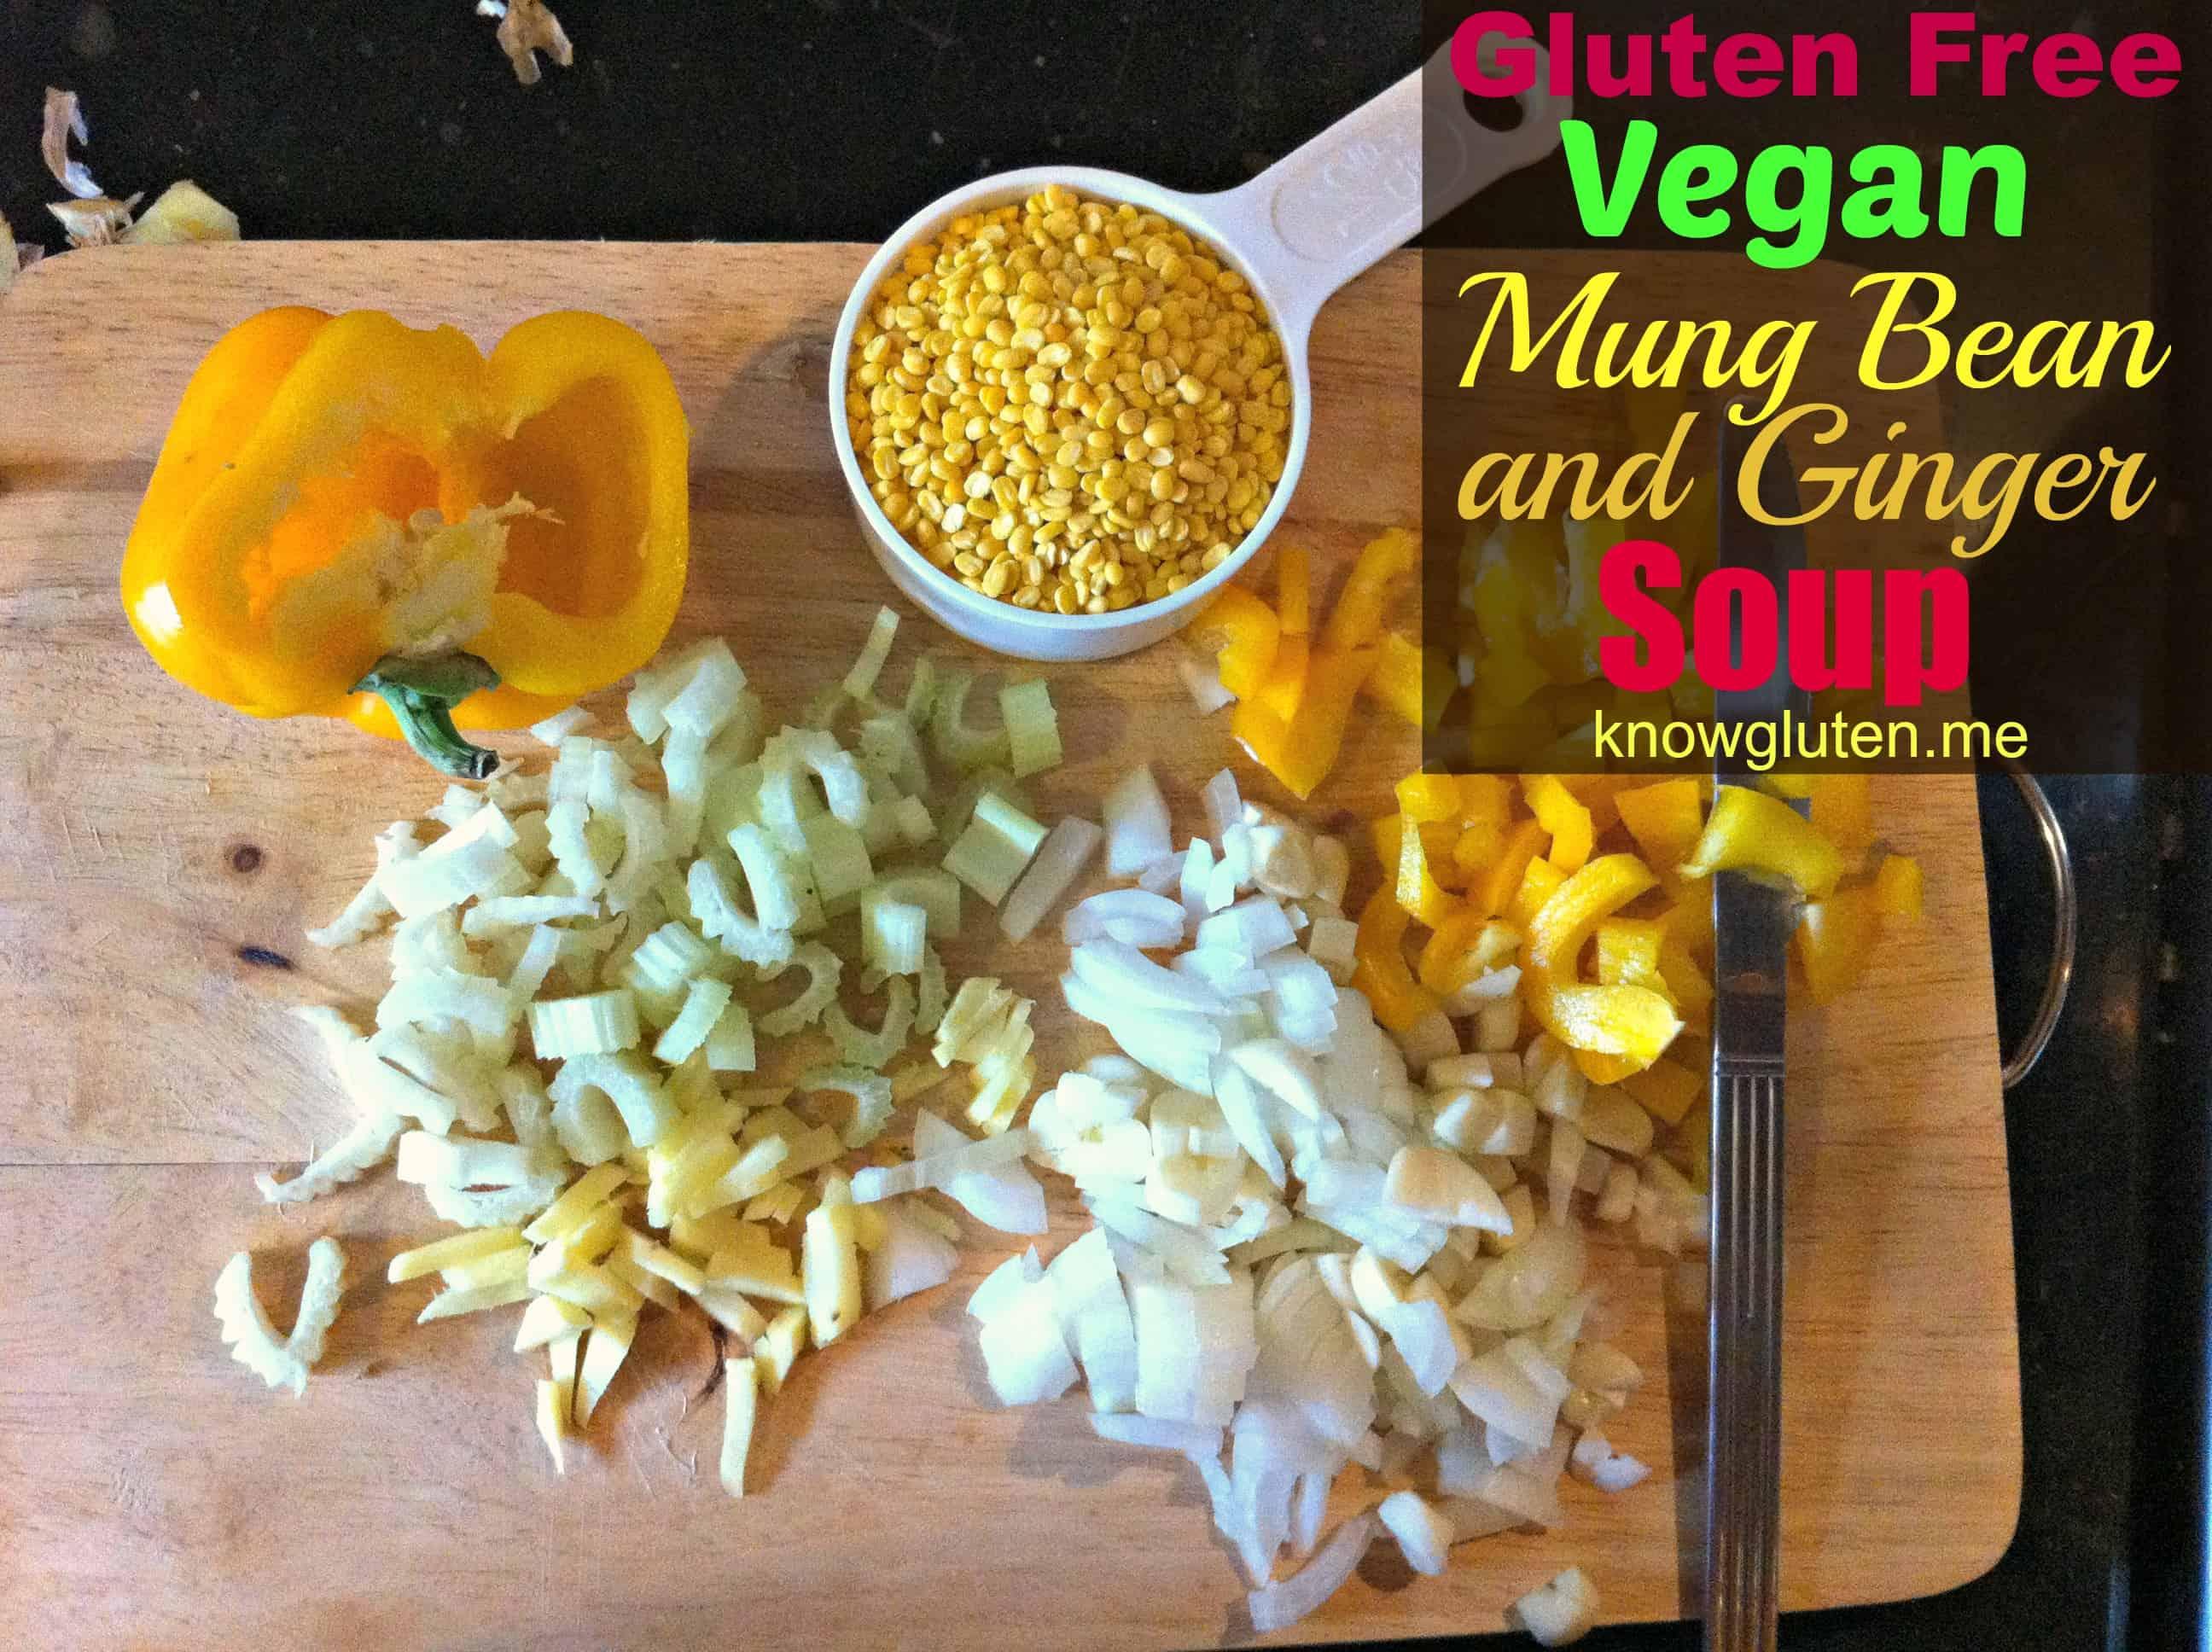 Gluten Free Vegan Mung Bean and Ginger Soup